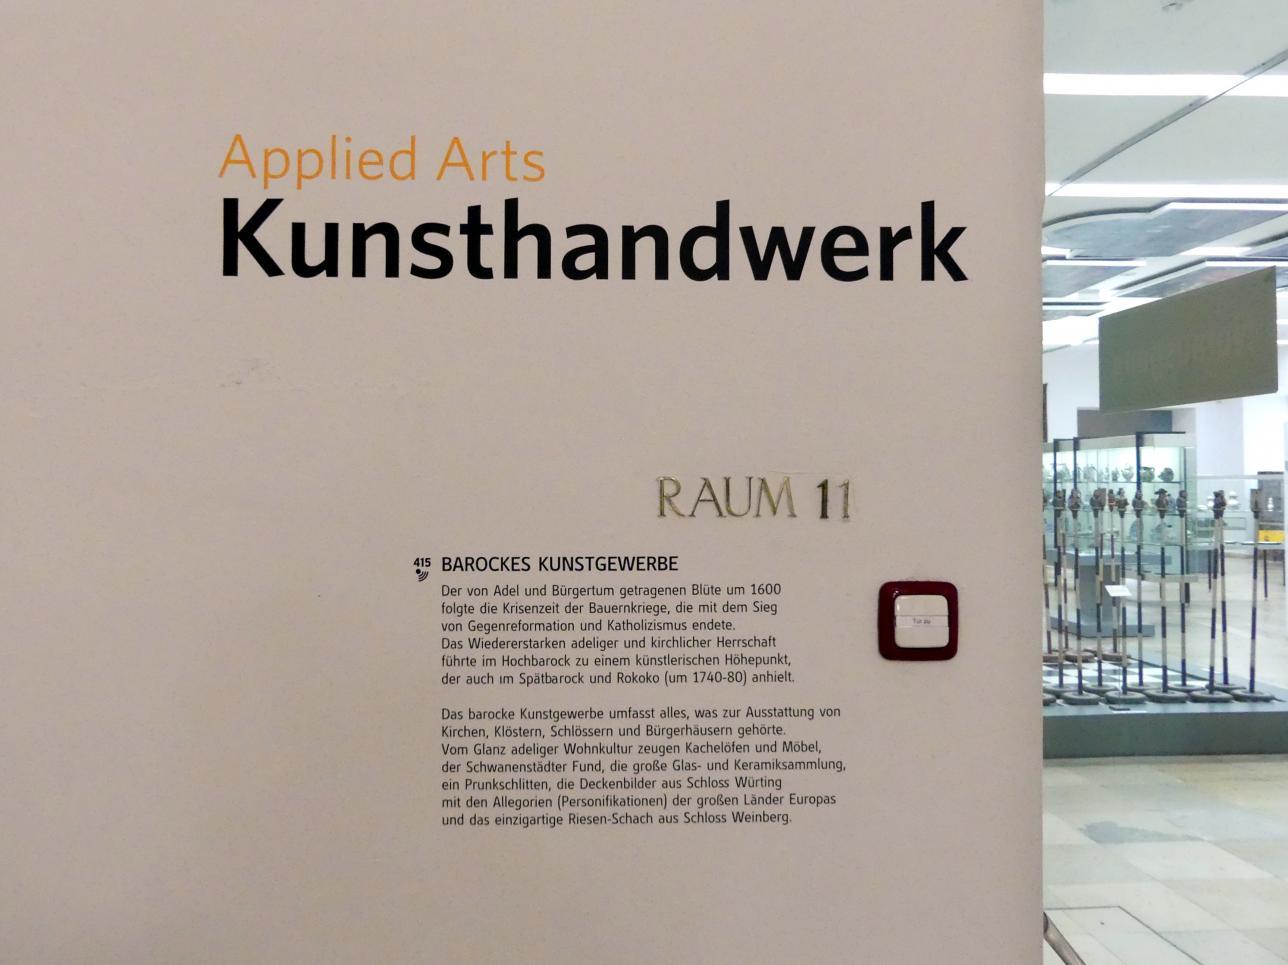 Linz, Oberösterreichisches Landesmuseum, Barockes Kunstgewerbe, Bild 4/4